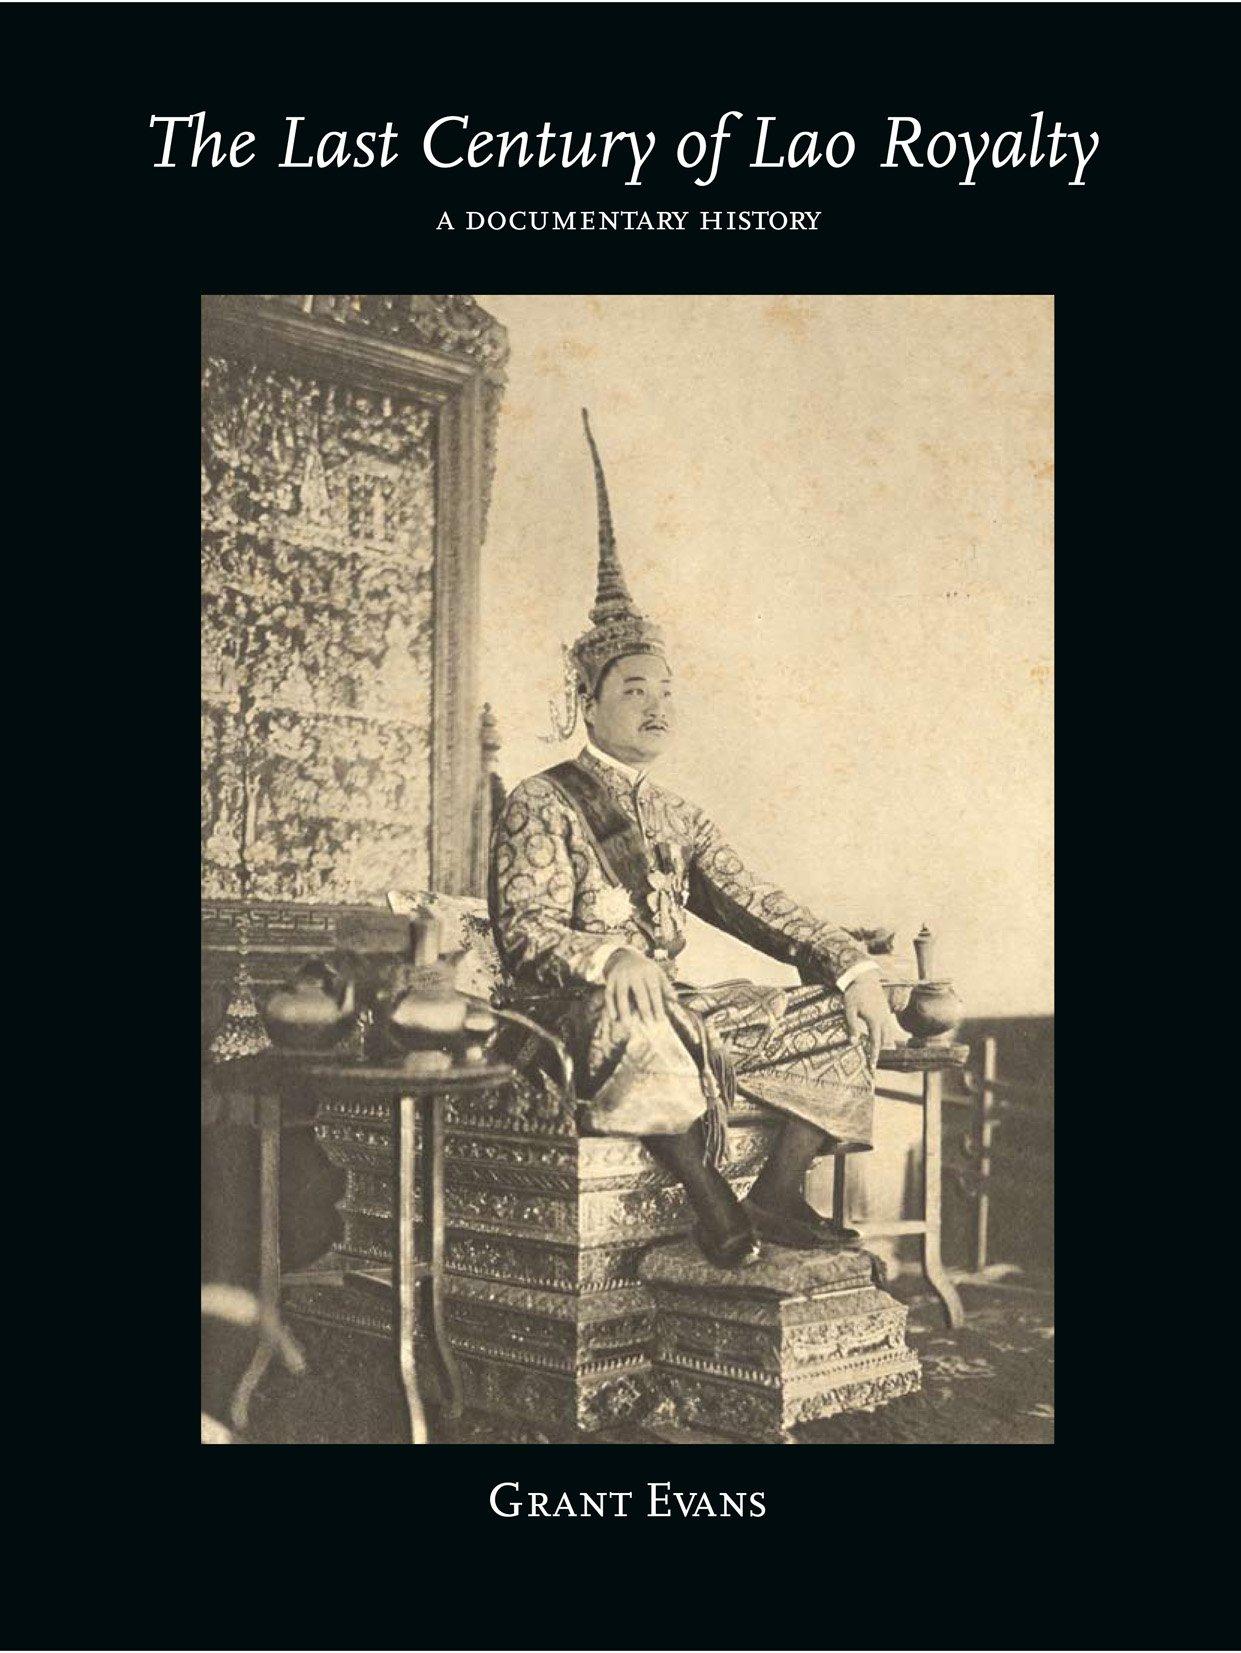 The Last Century of Lao Royalty: A Documentary History: Grant Evans: 9786162150081: Amazon.com: Books